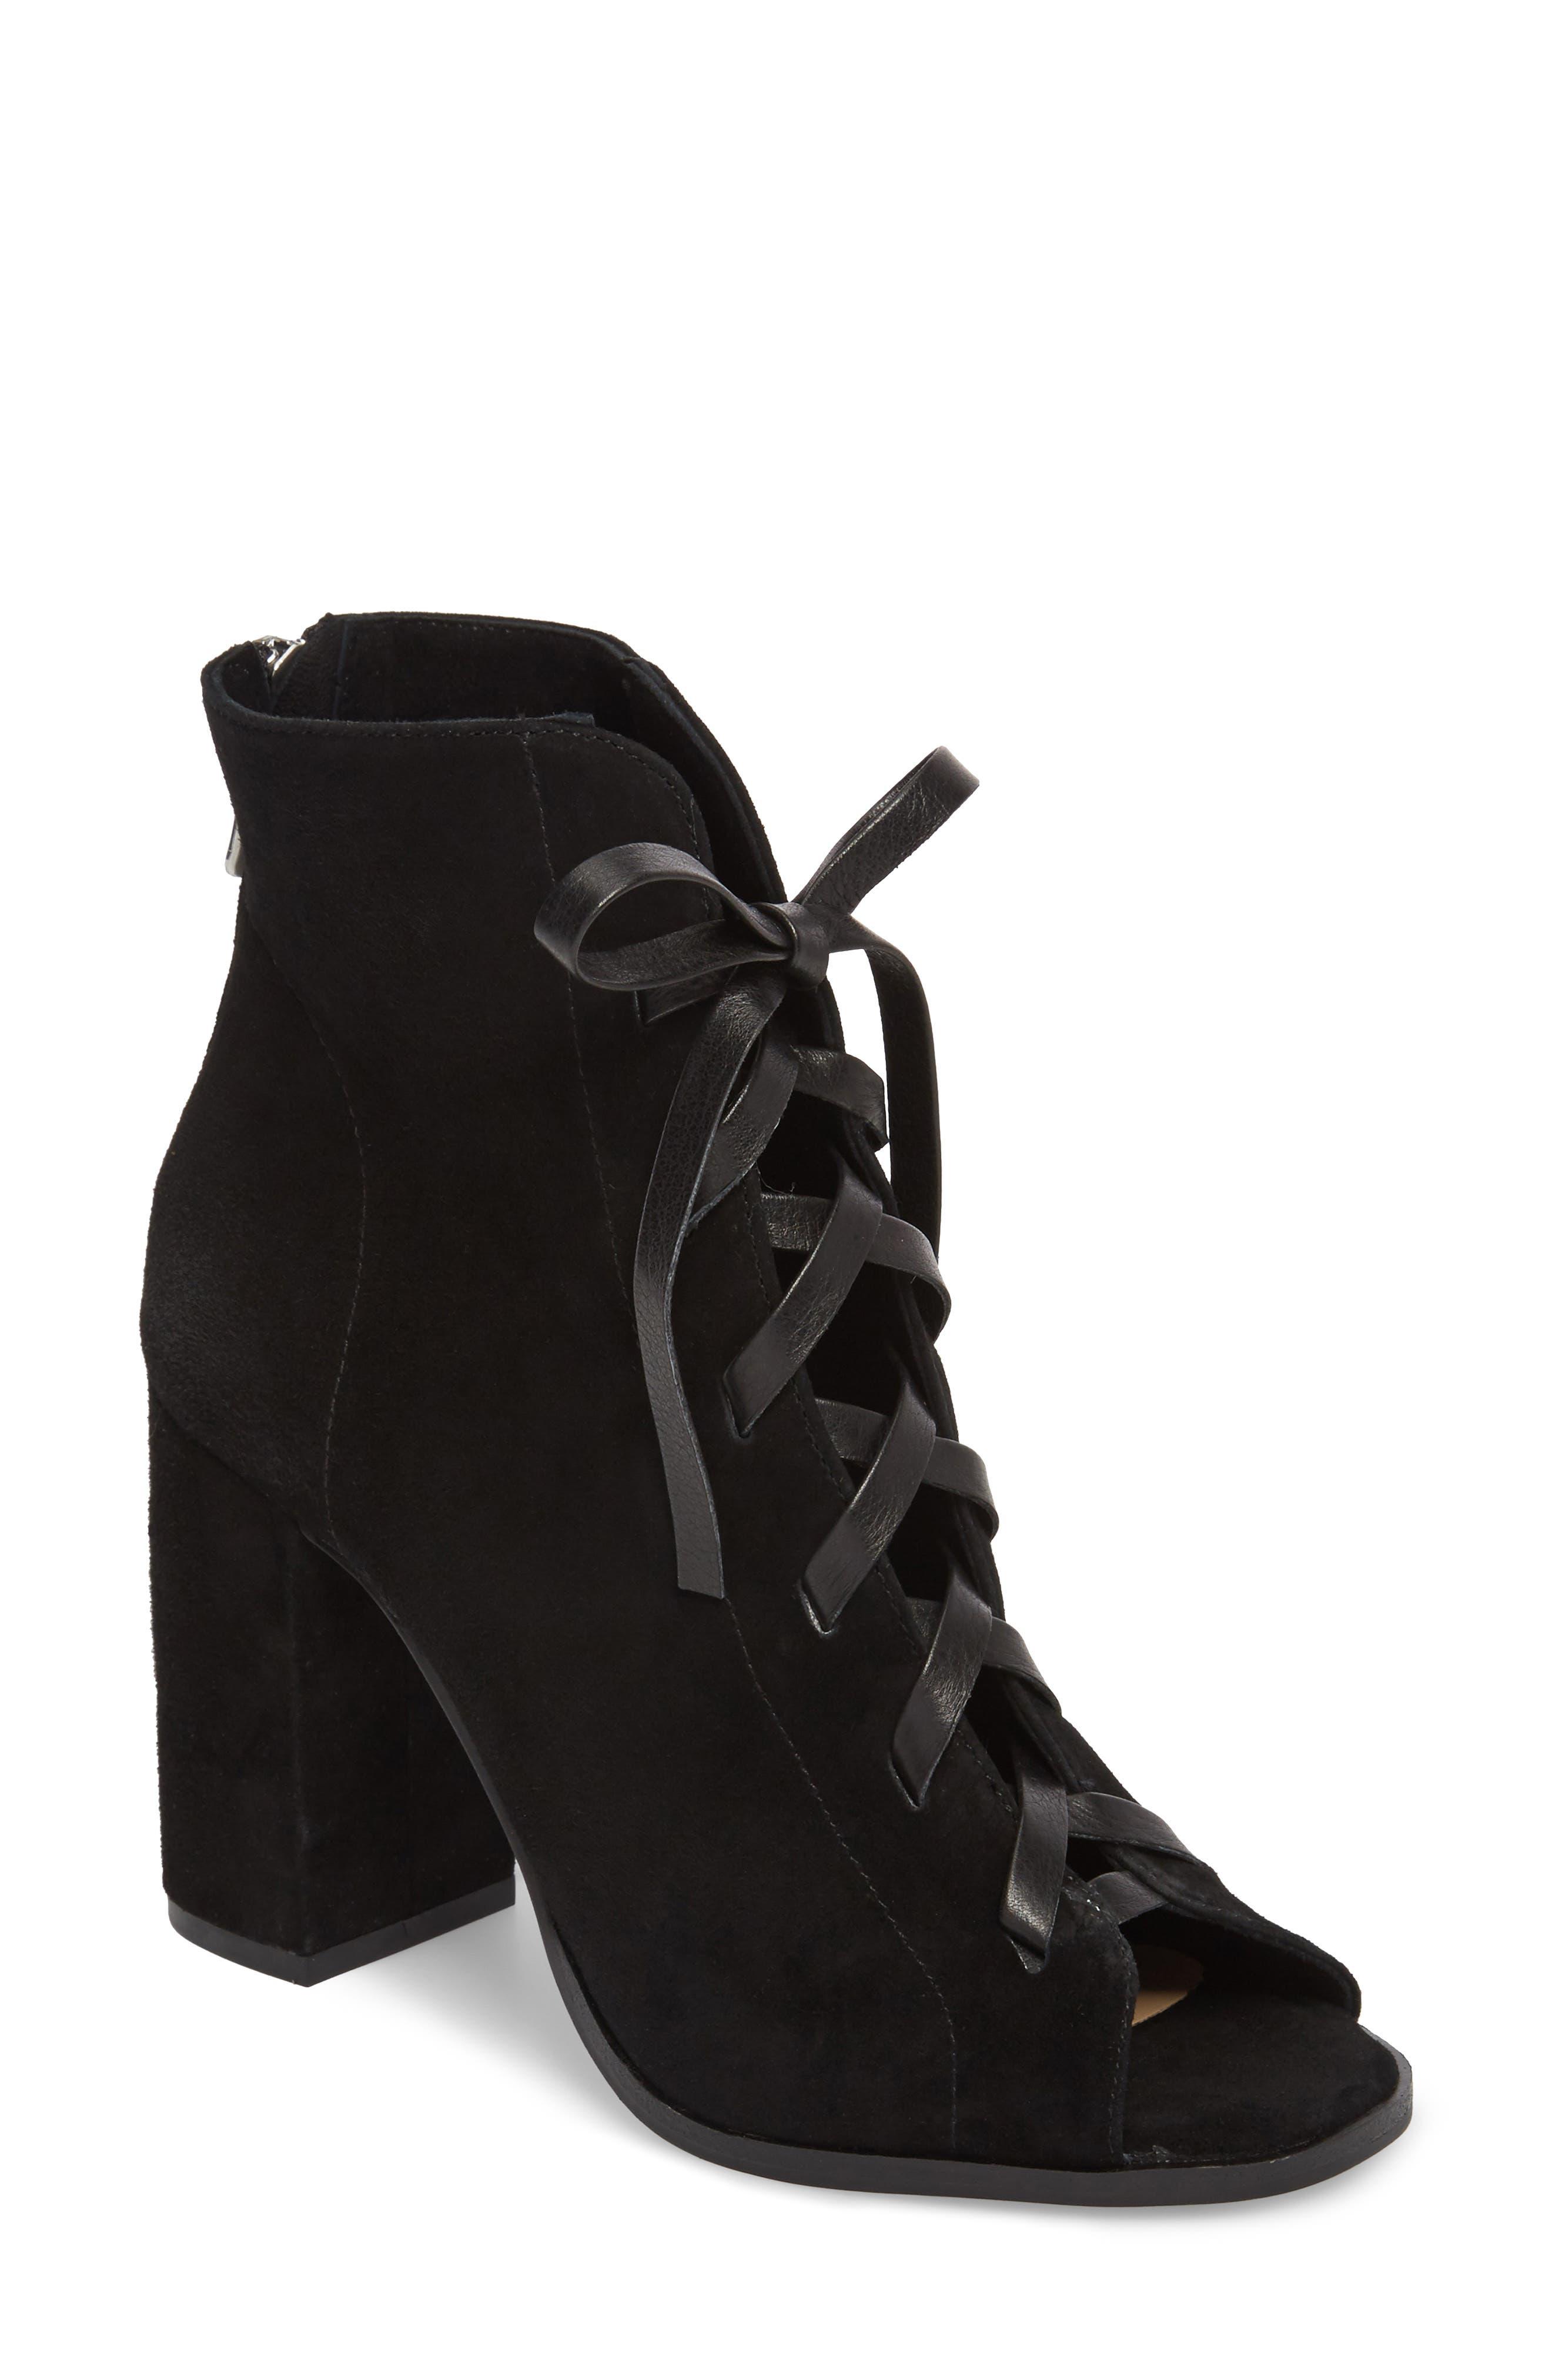 Alternate Image 1 Selected - Kristin Cavallari Layton Lace-Up Boot (Women)